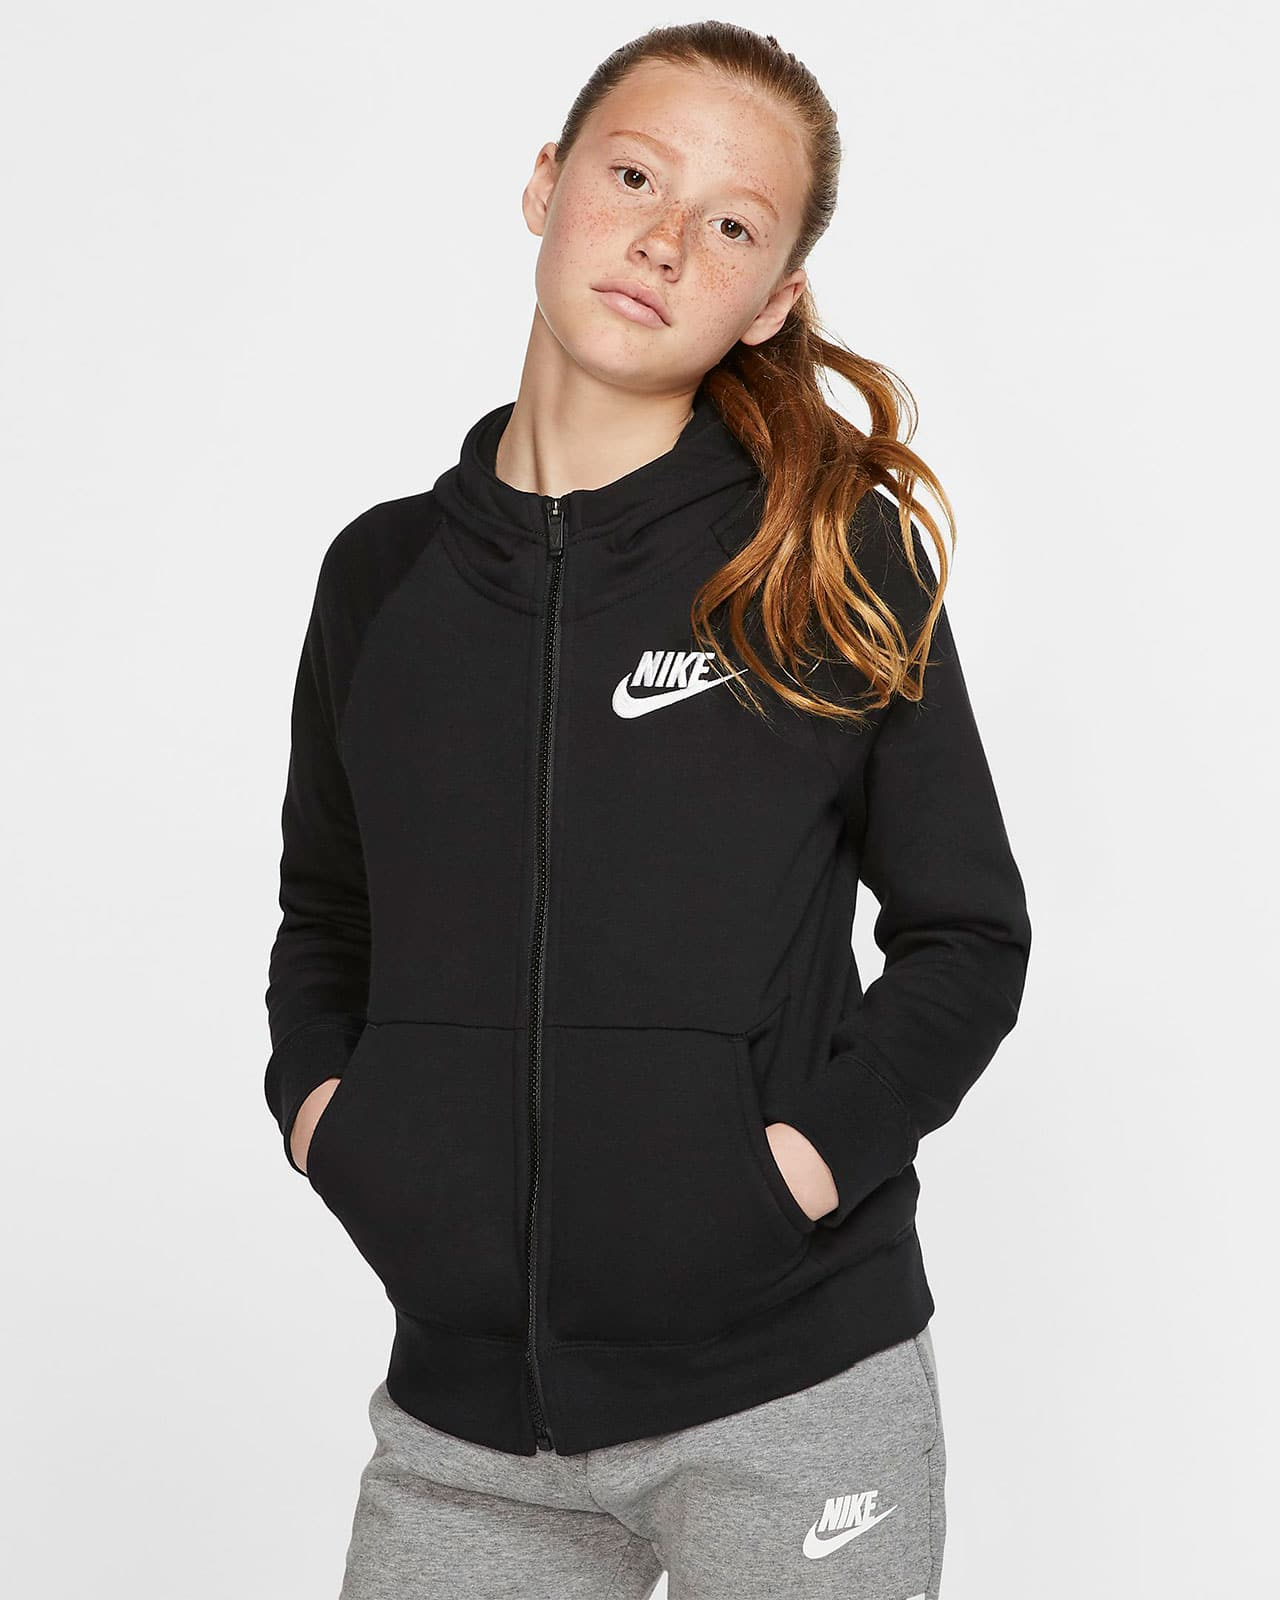 Толстовка Nike с молнией во всю длину